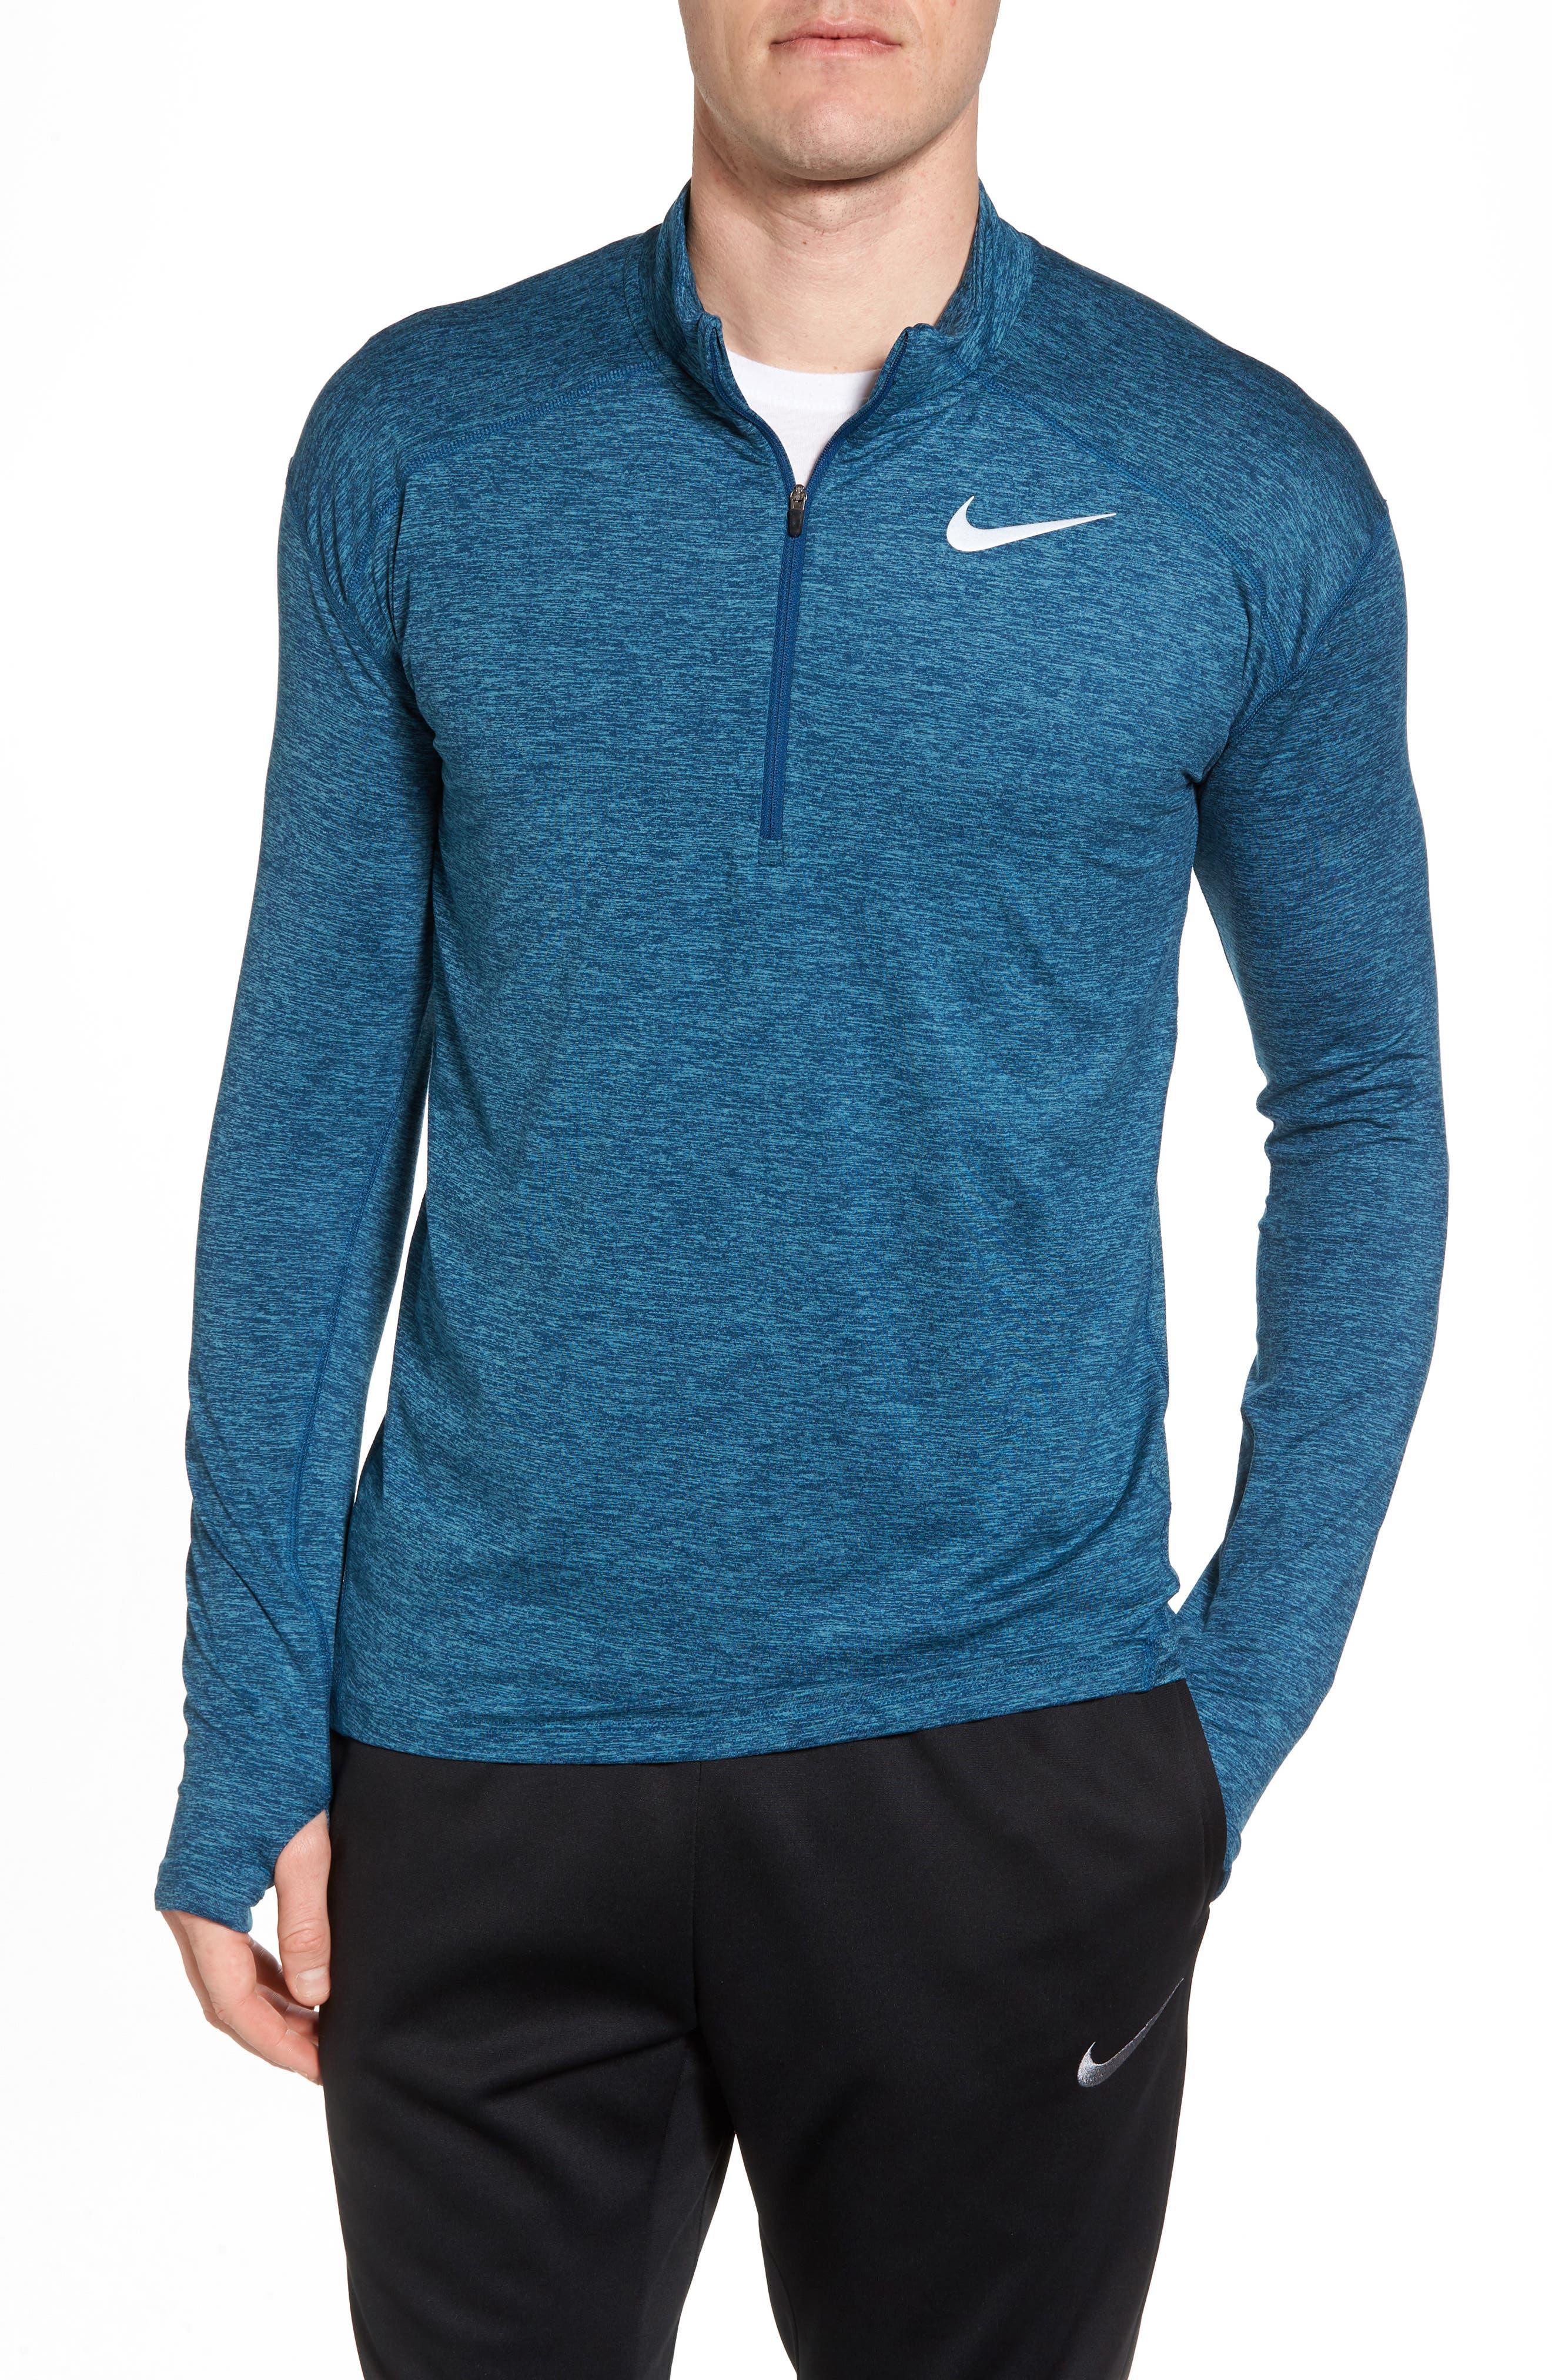 Alternate Image 1 Selected - Nike Dry Element Running Top